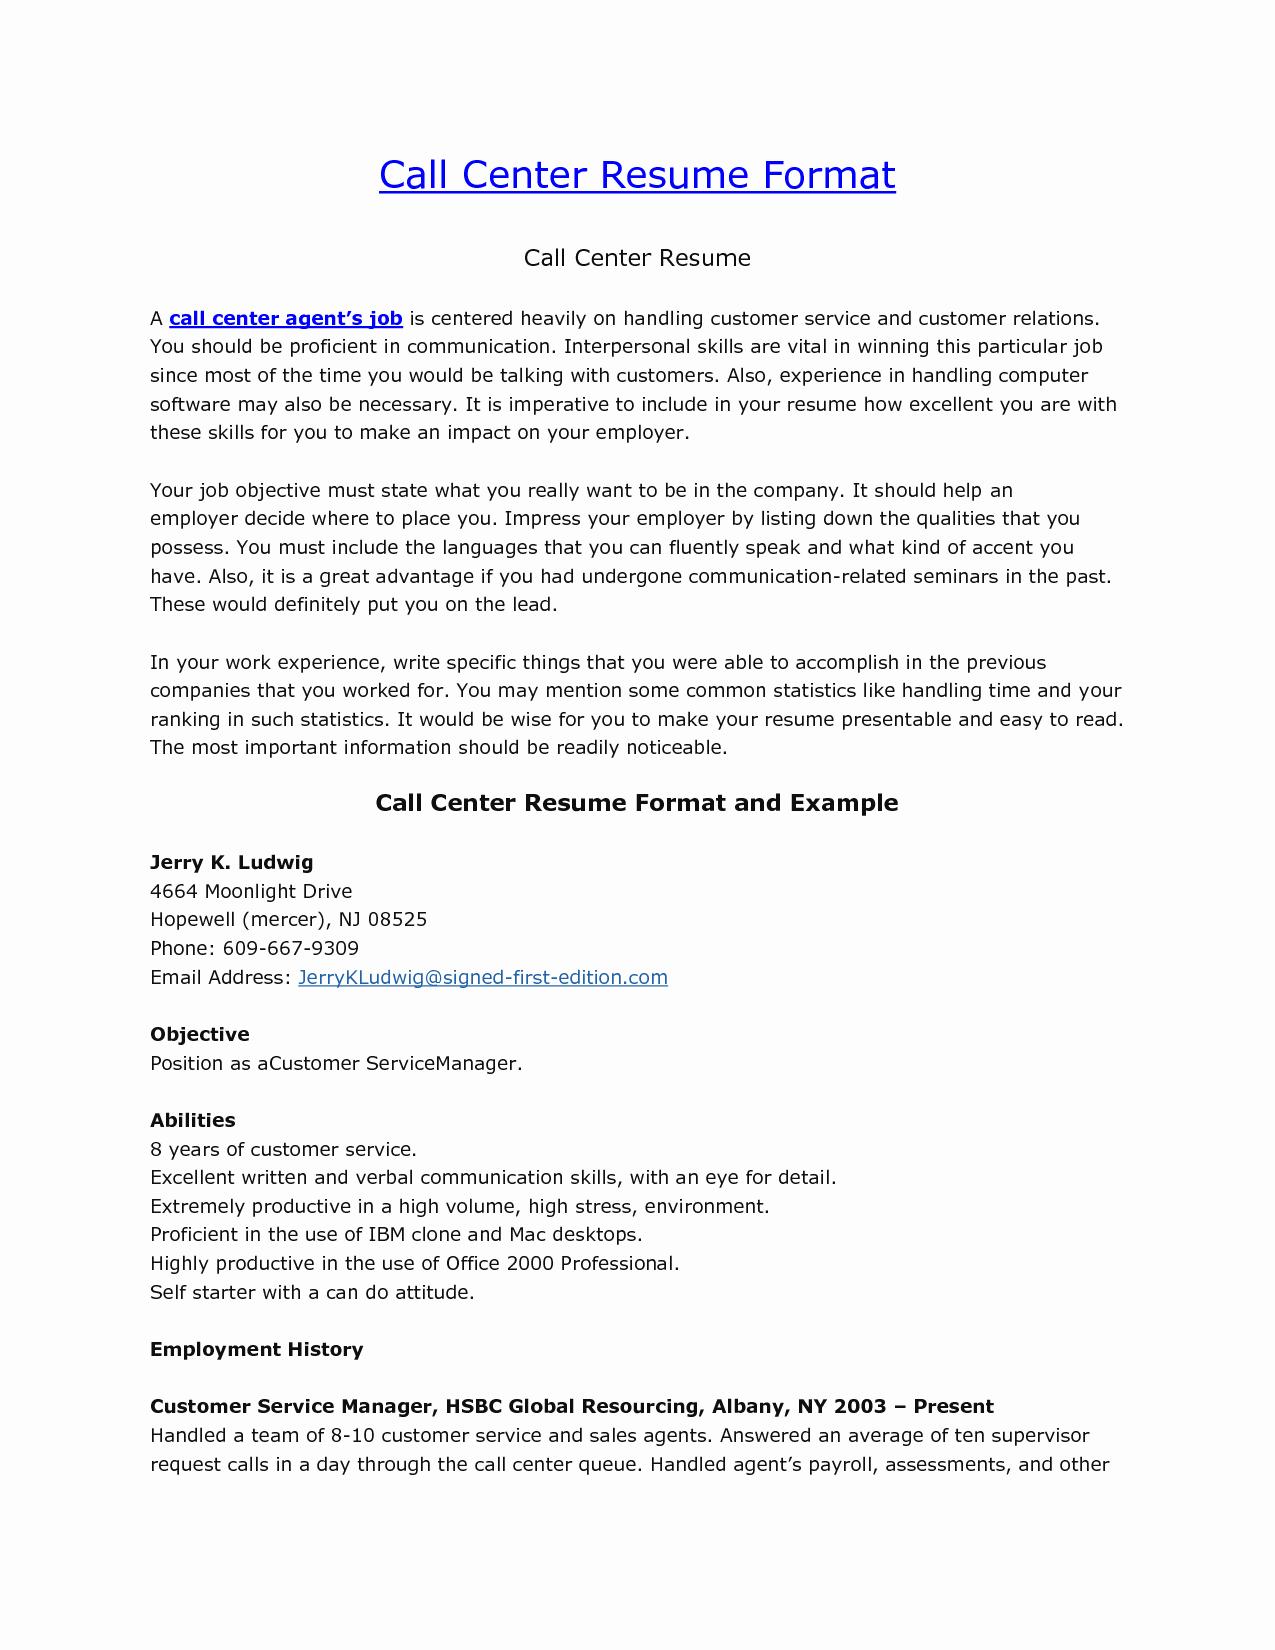 Call Center Customer Service Job Description Resume